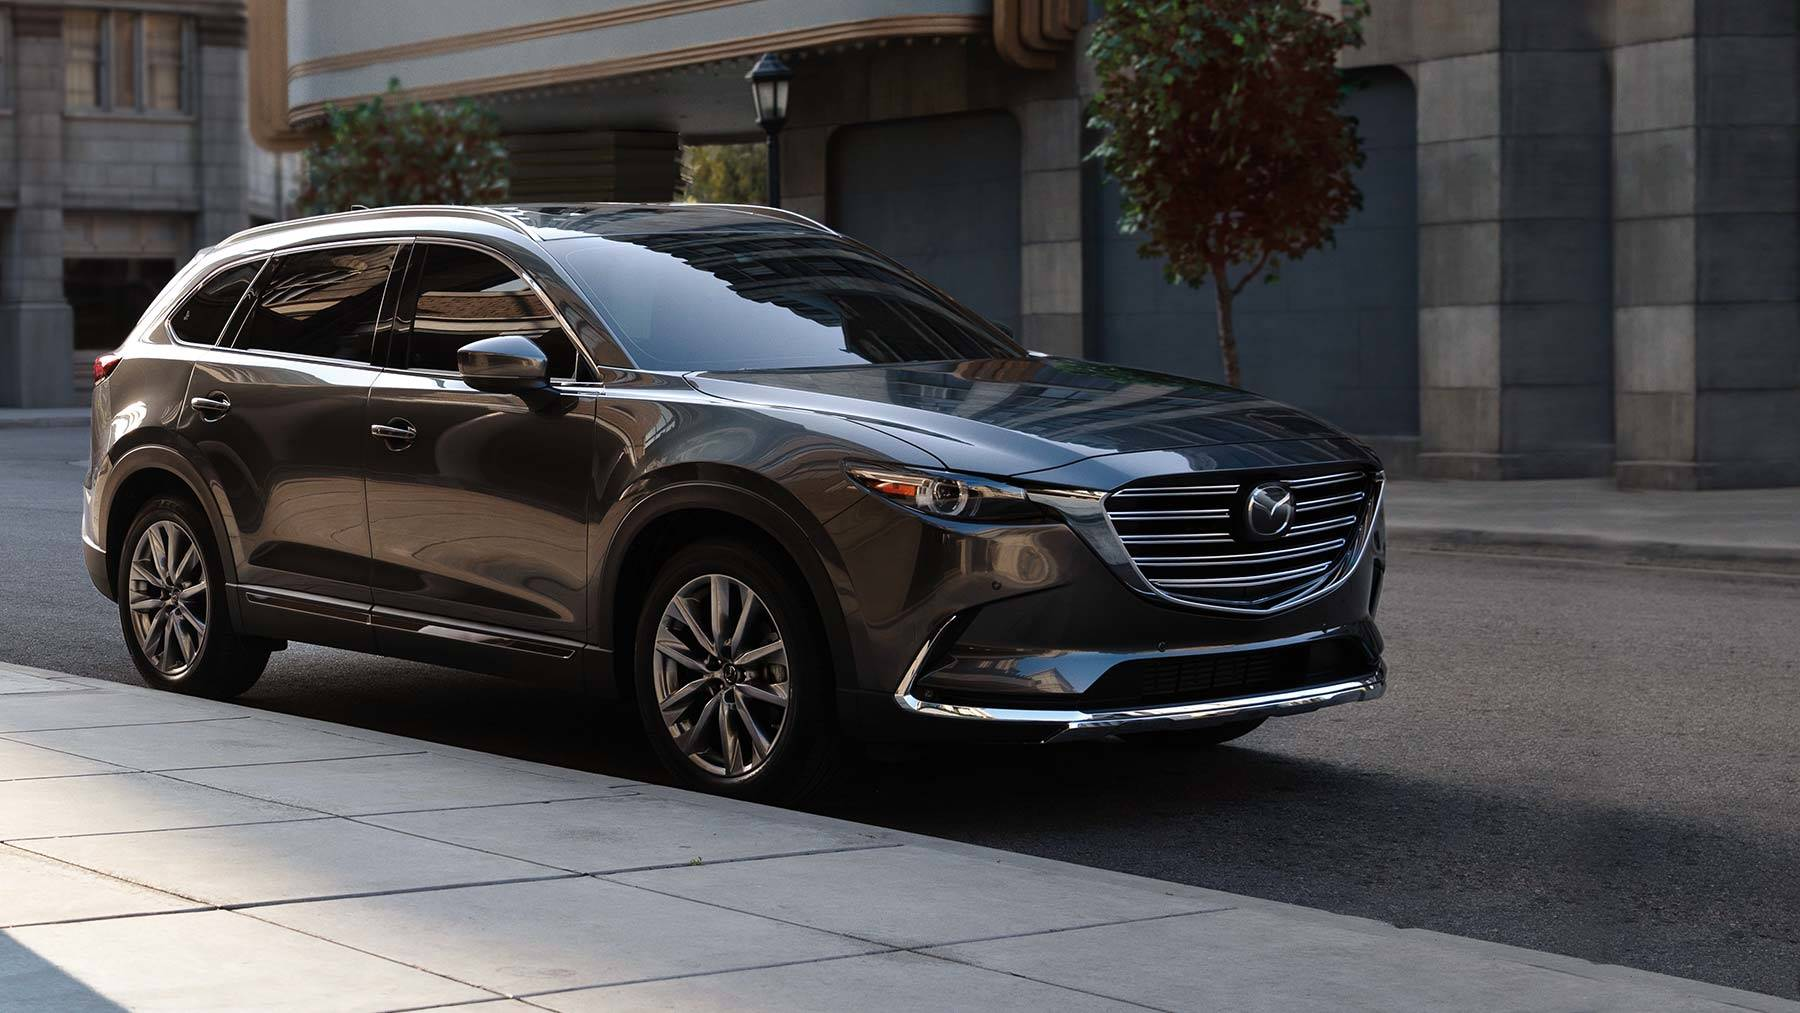 2019 Mazda CX-9 Financing near Universal City, TX